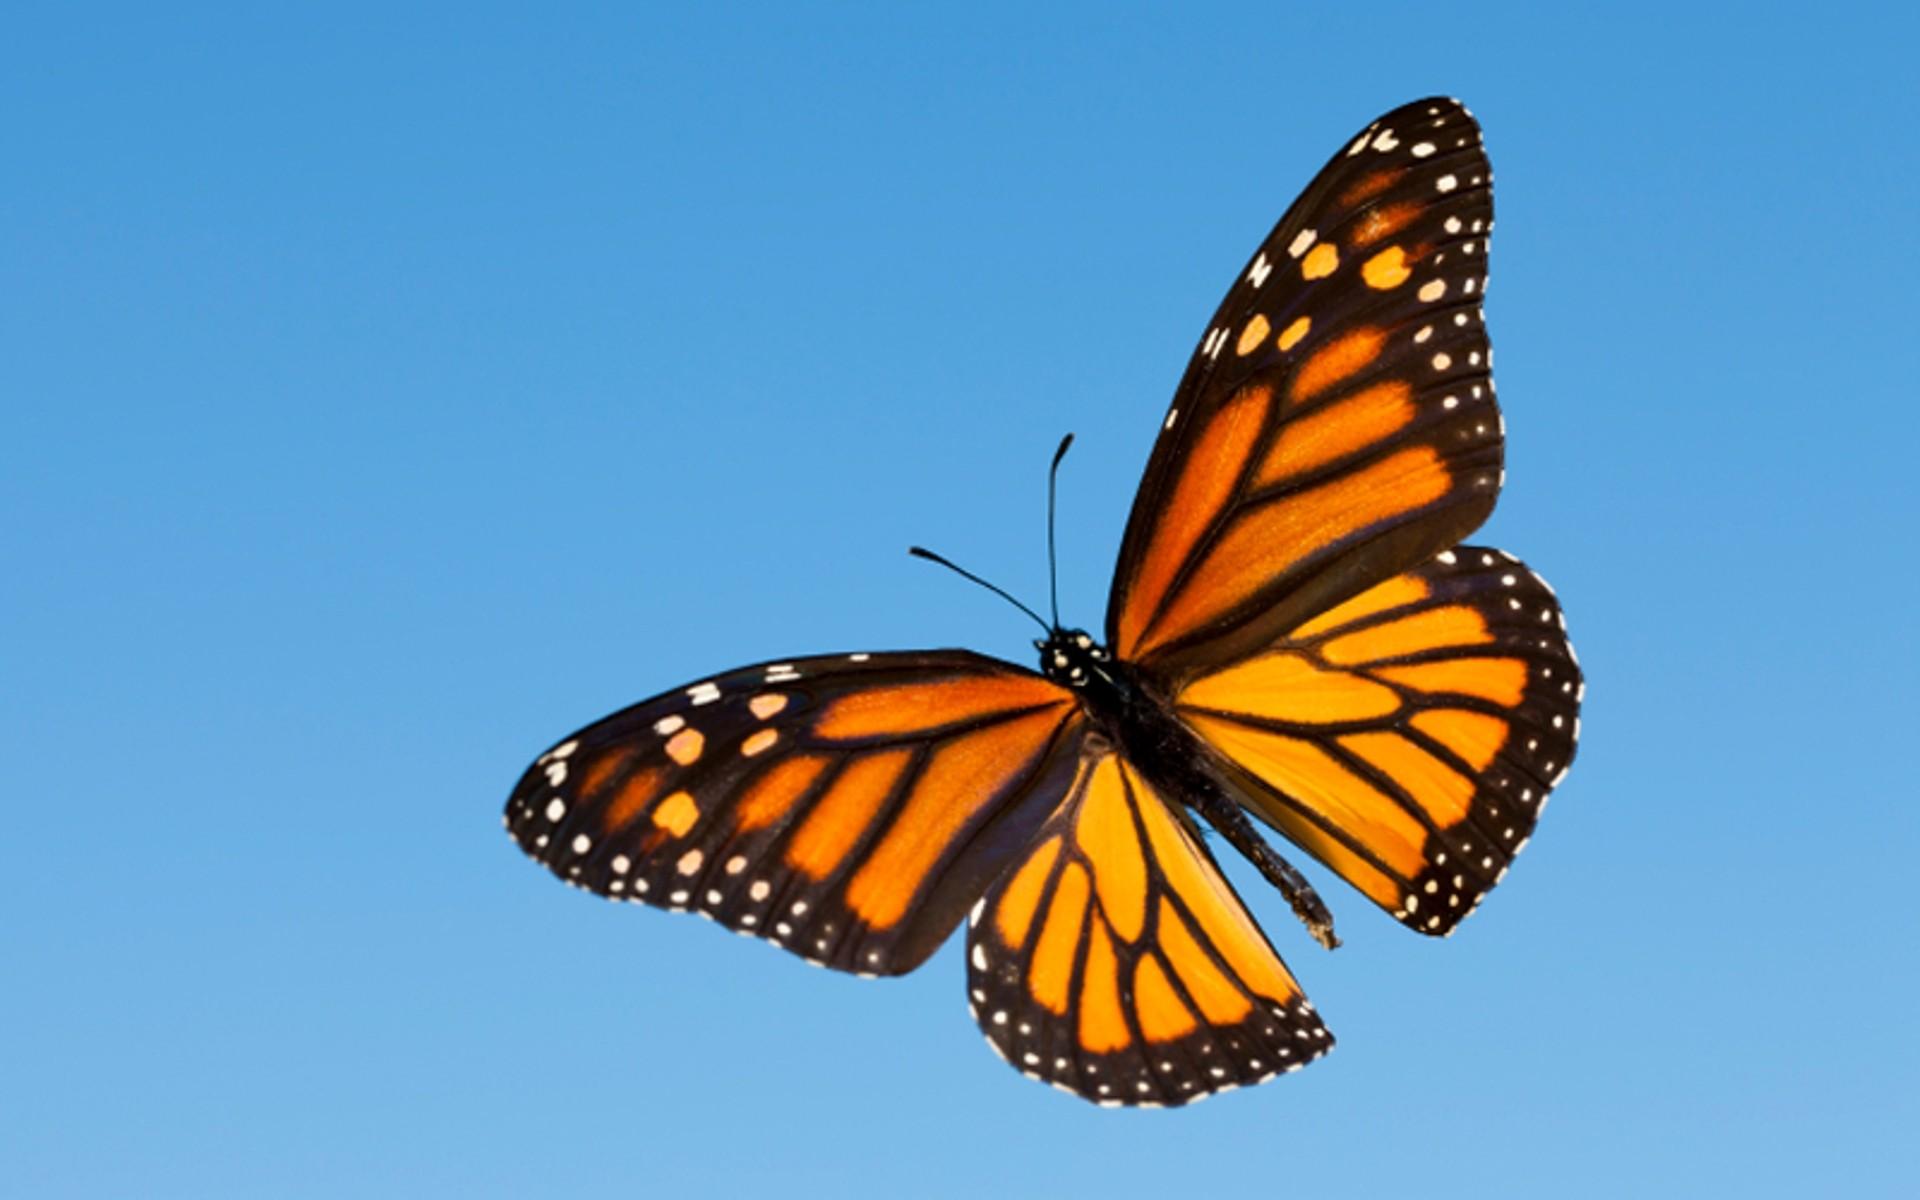 butterfly wallpaper download free beautiful full hd wallpapers